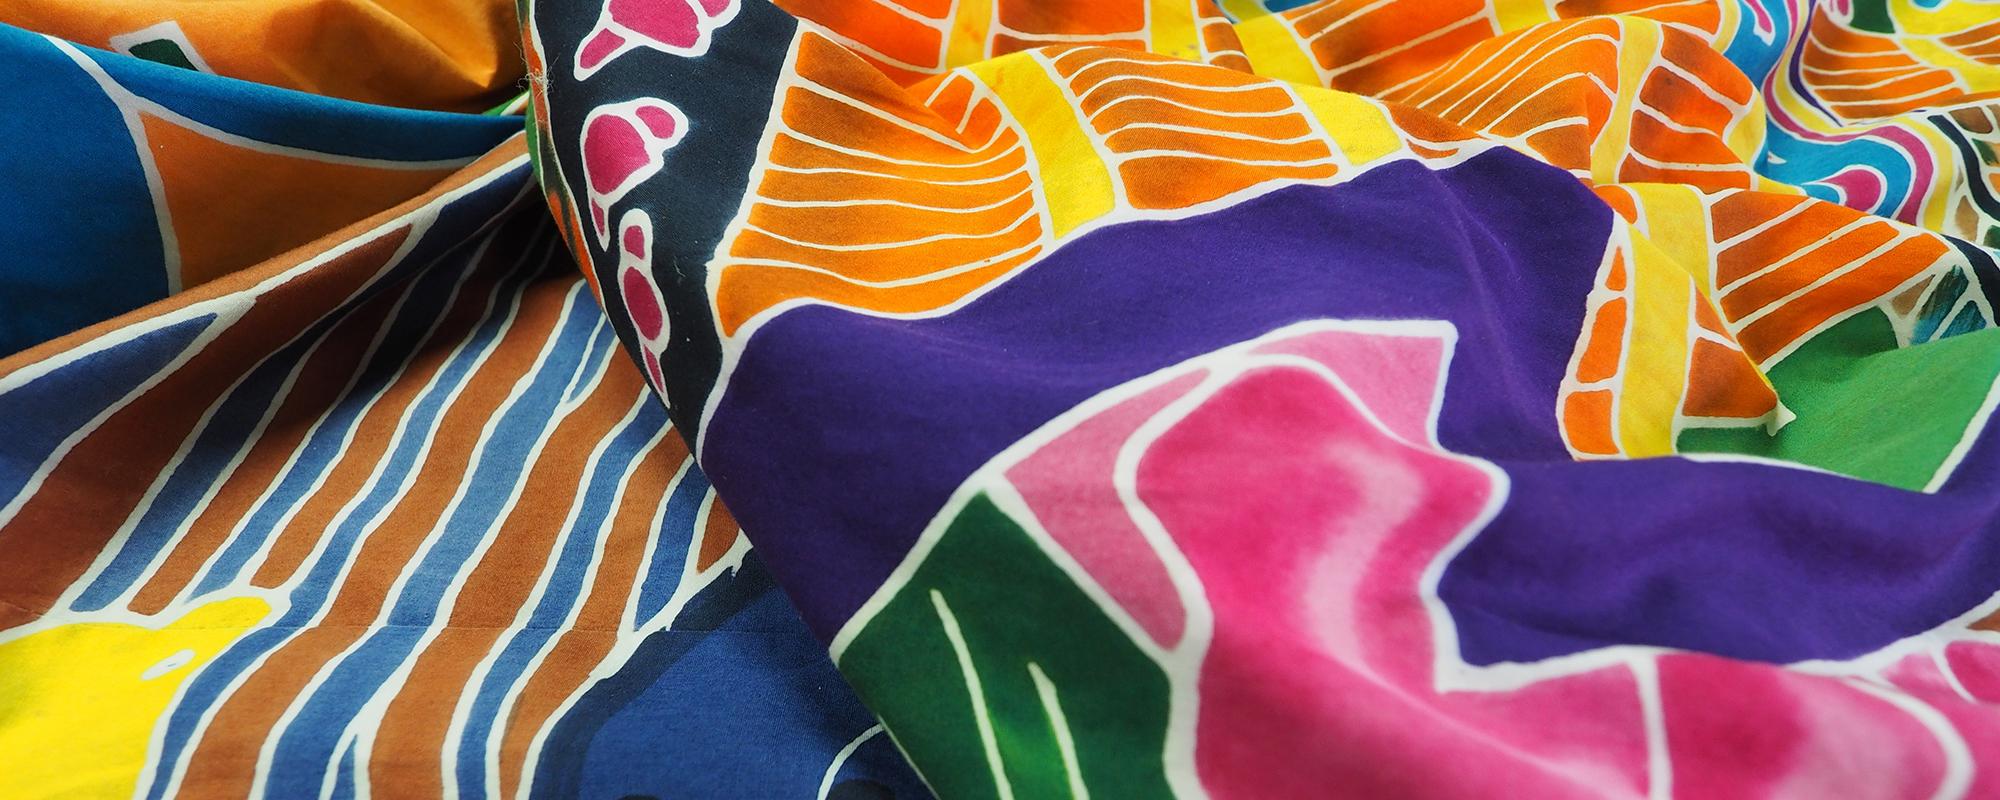 KONBAG 金比羅歌舞伎大芝居の幟デザイン 香川県の伝統的工芸を身近に